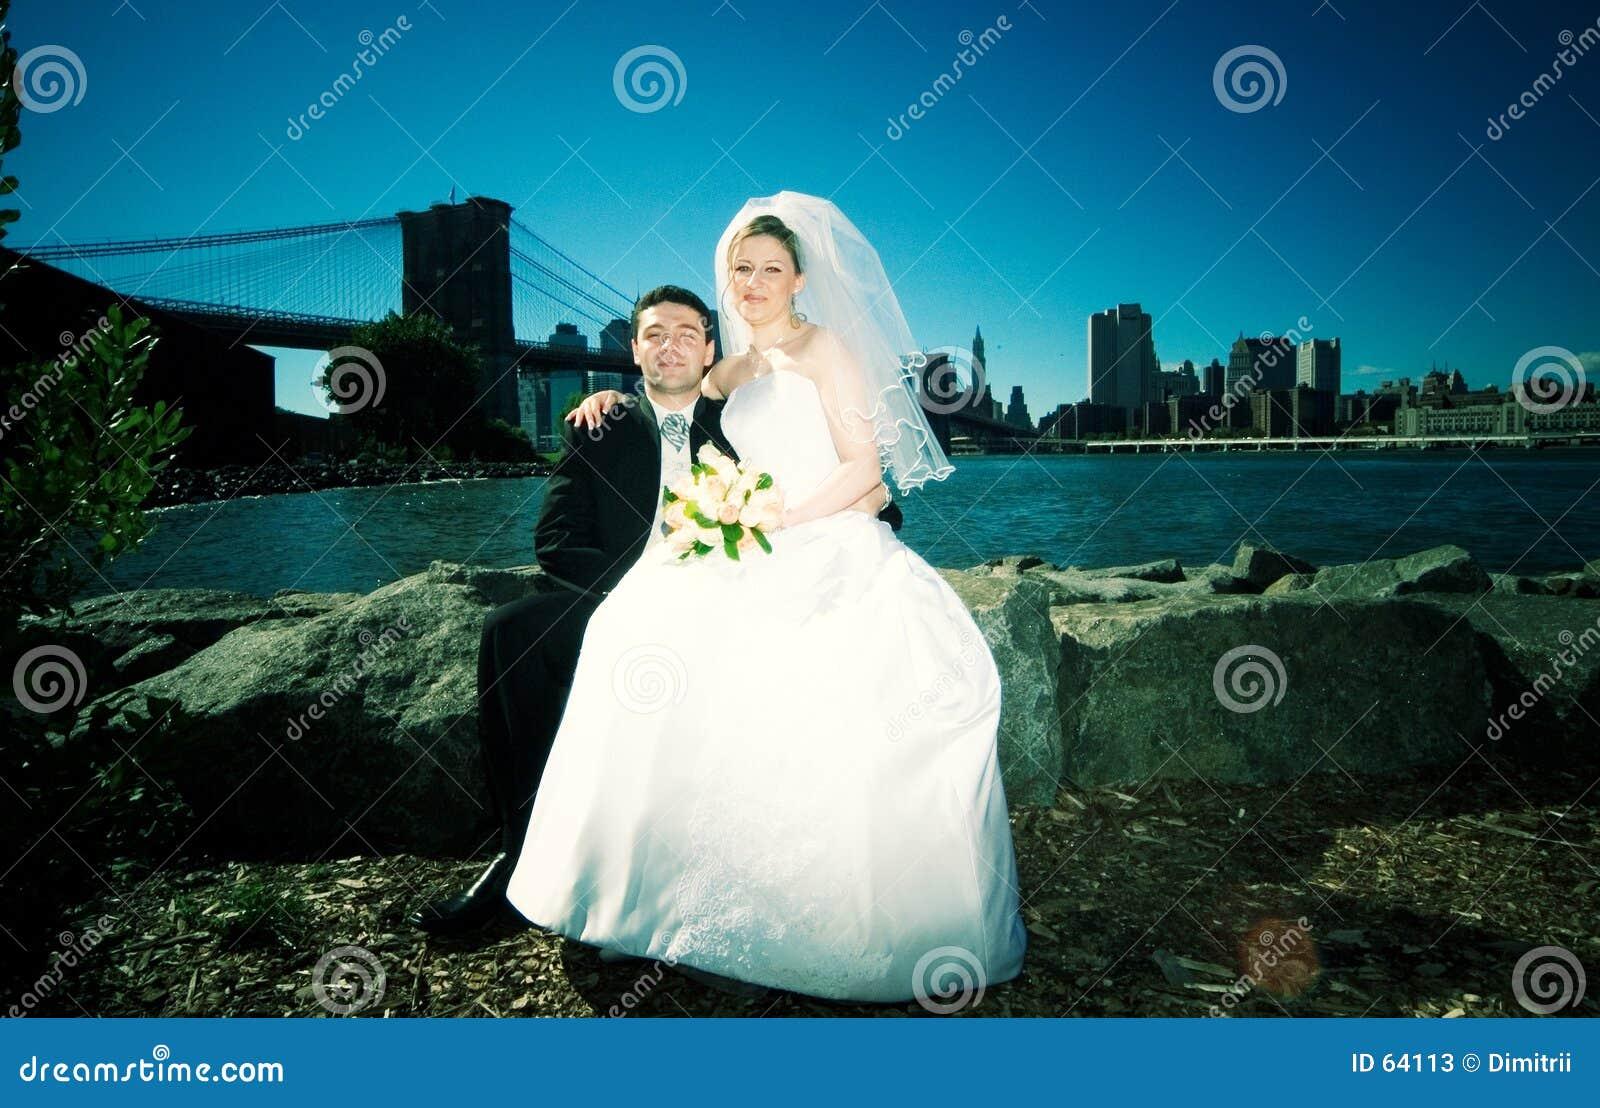 Nya gifta sig york